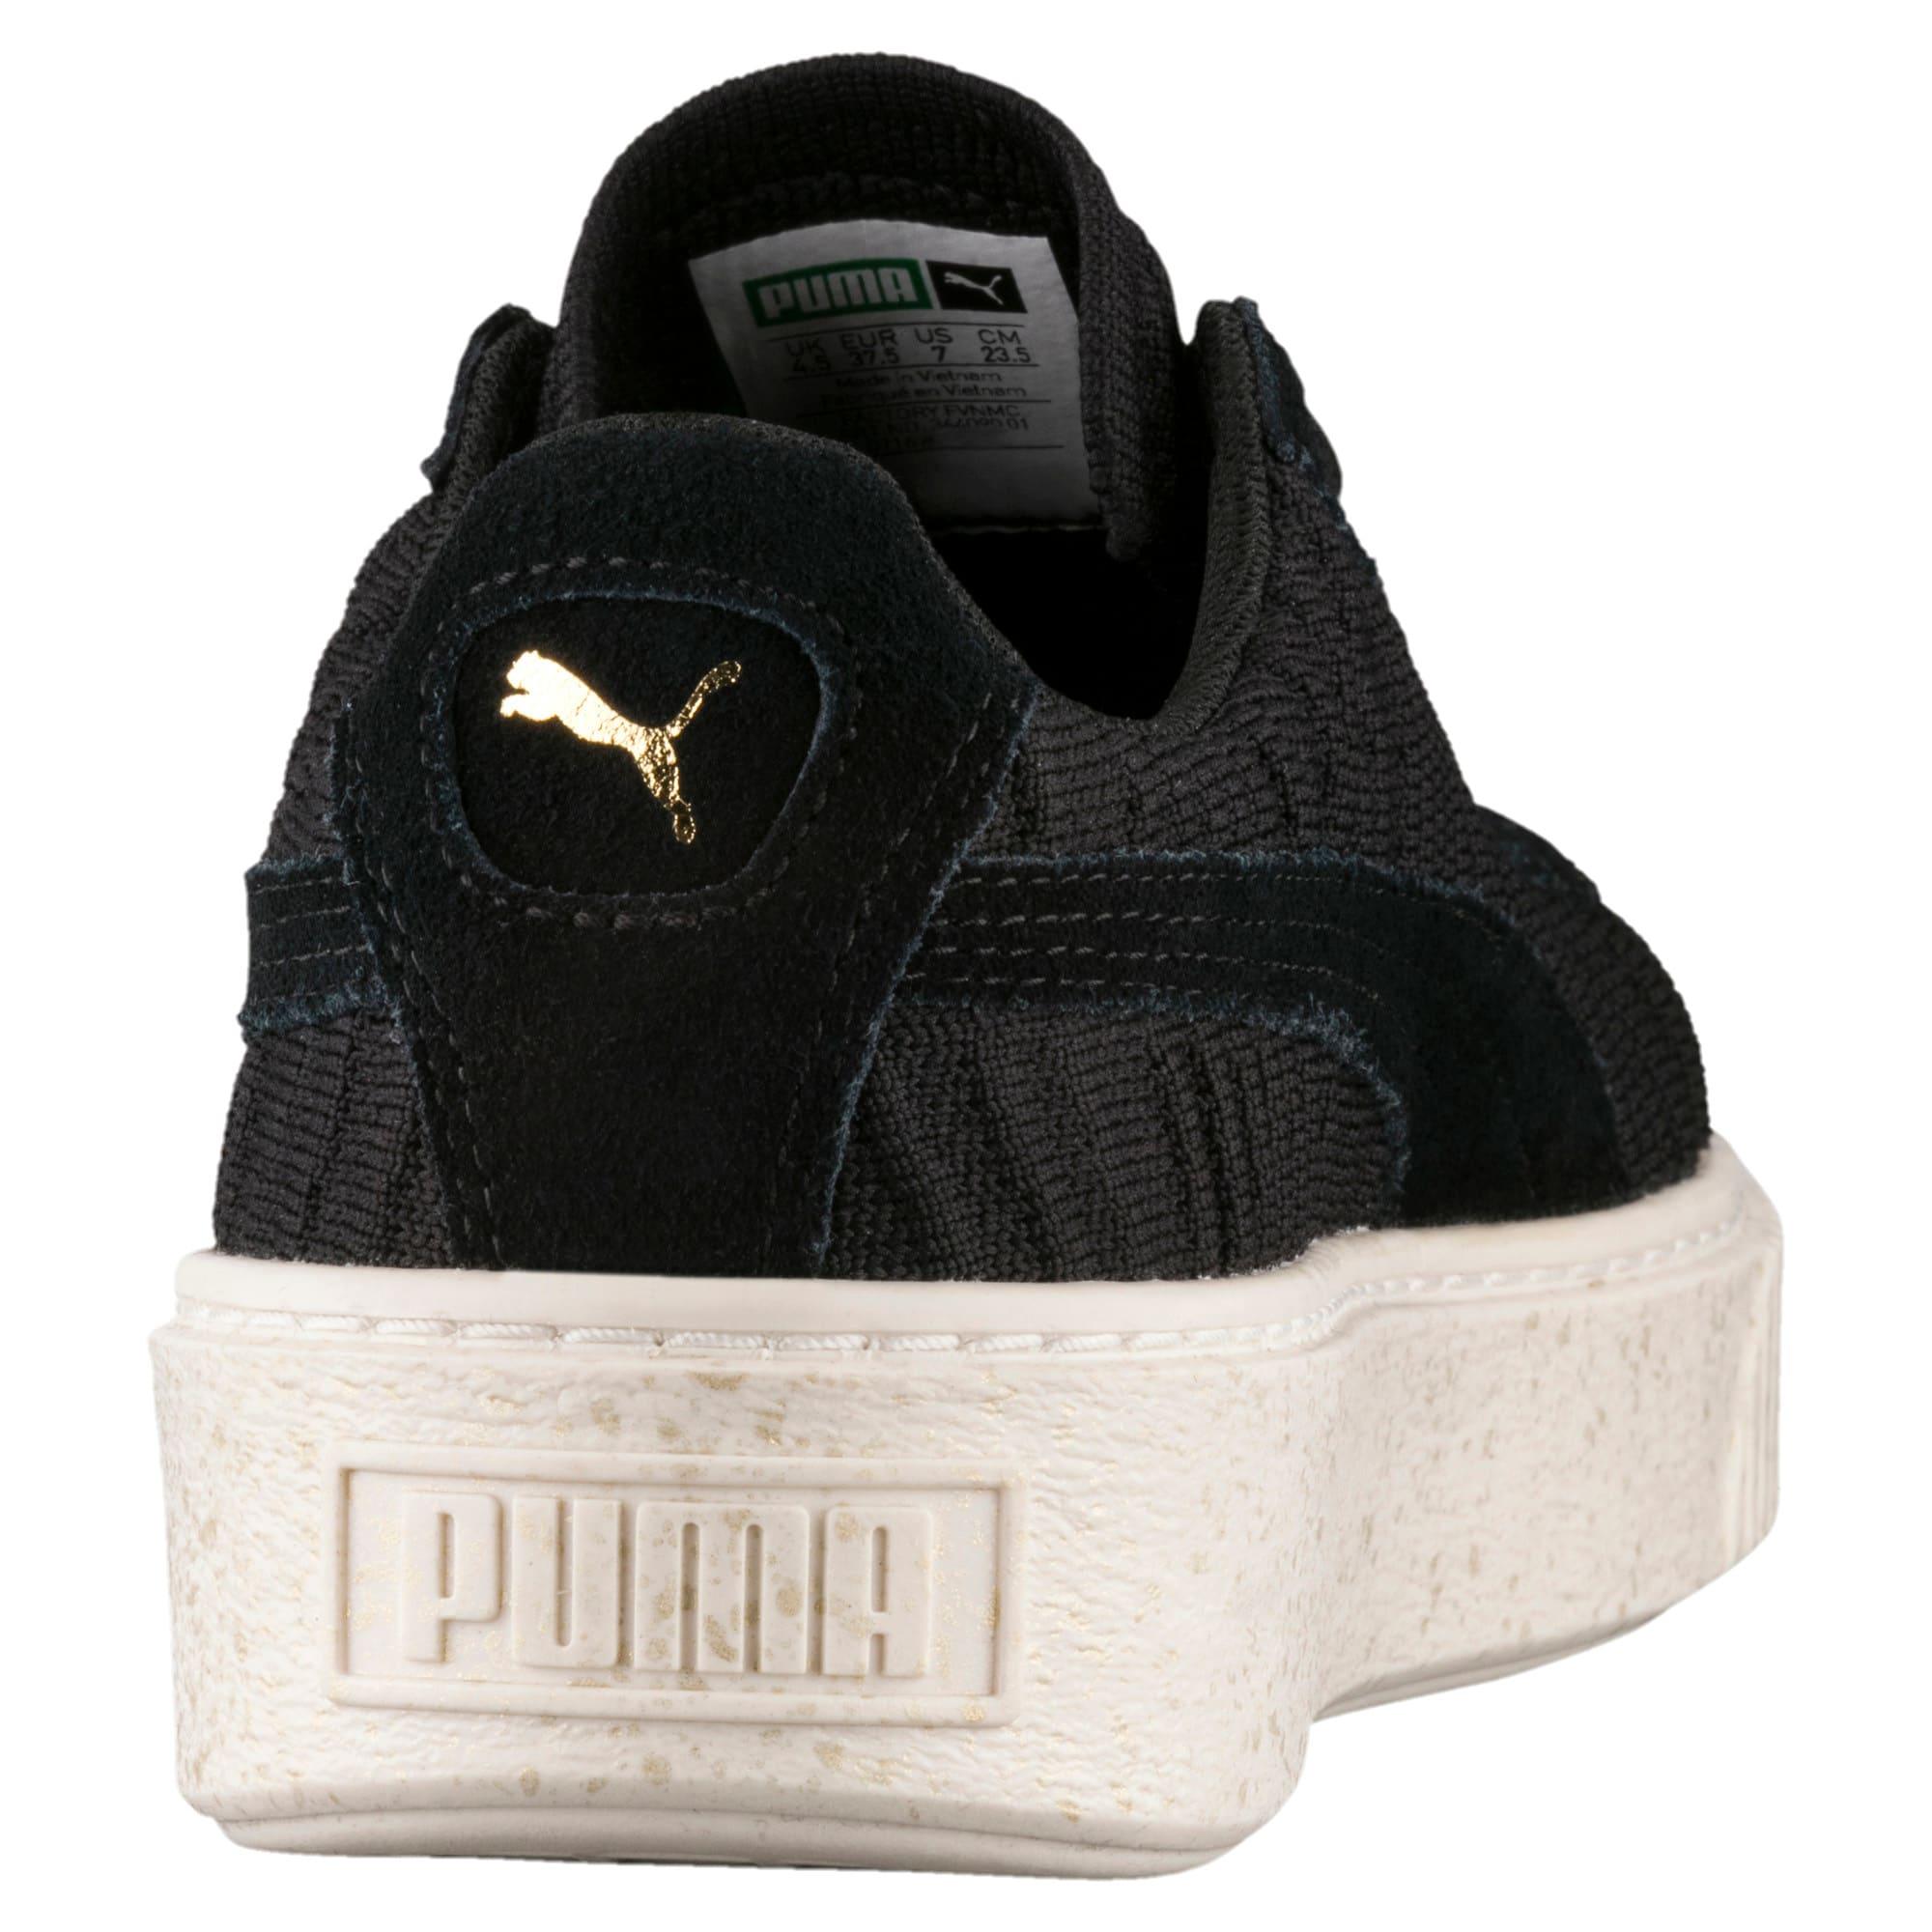 Thumbnail 4 of Basket Platform Women's Sneakers, PBlack-PBlack-Whisper White, medium